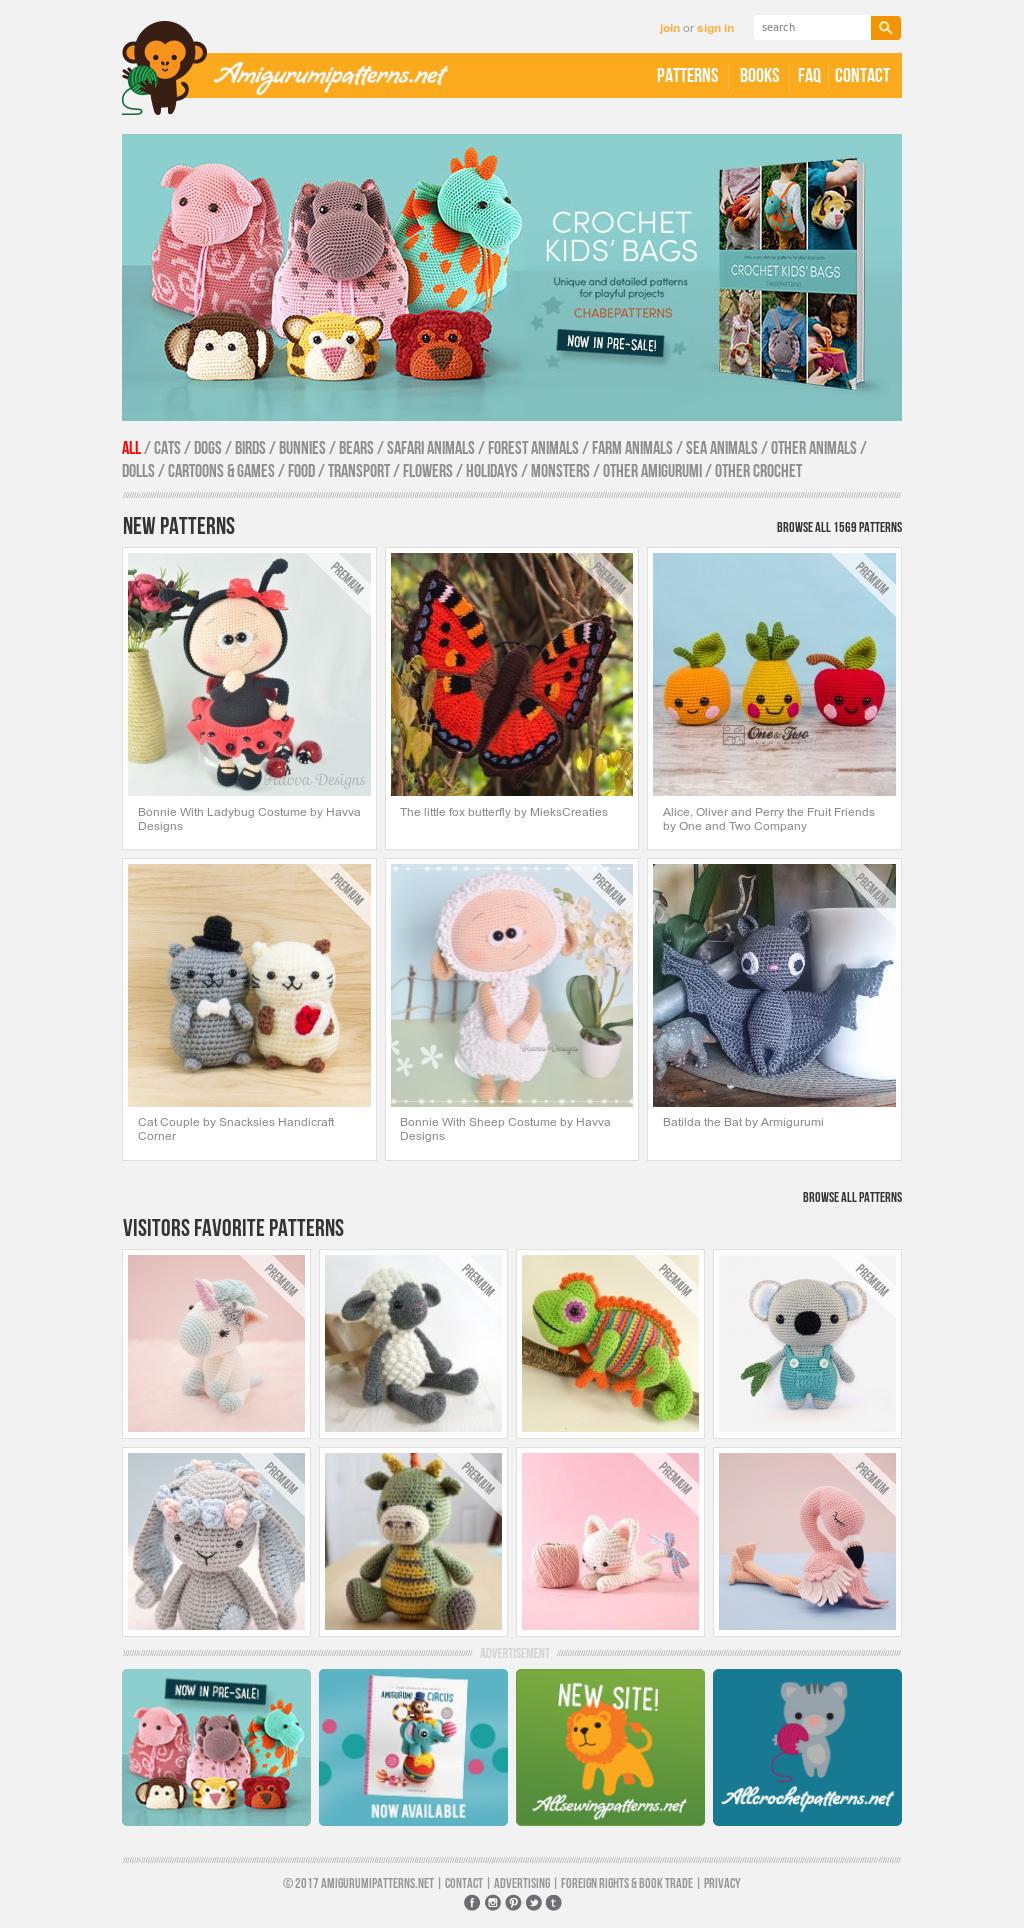 Zoomigurumi 7: 15 Cute Amigurumi Patterns by 11 Great Designers by ... | 1928x1024